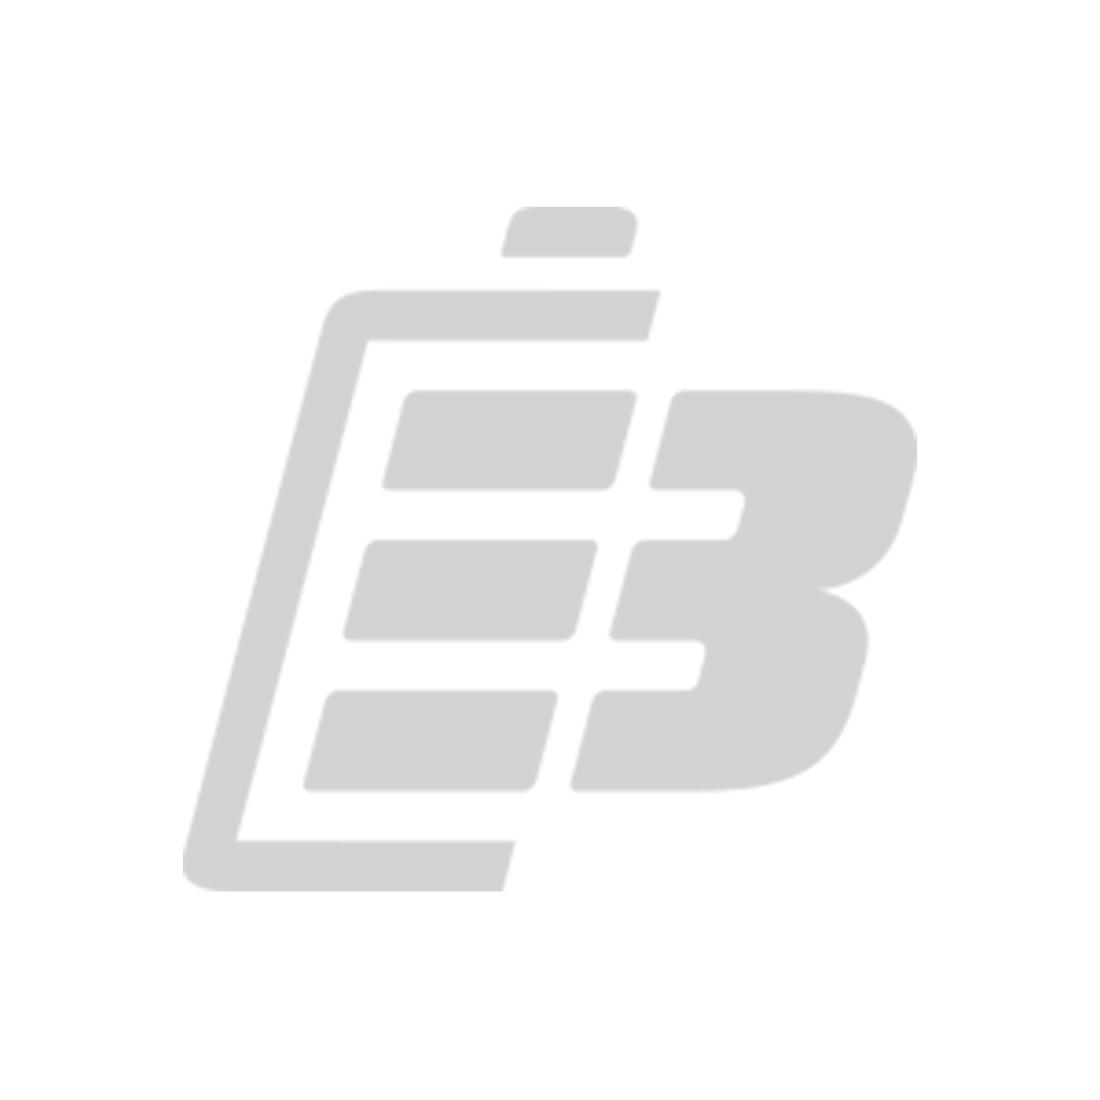 Smartphone battery Blackberry Z10_1